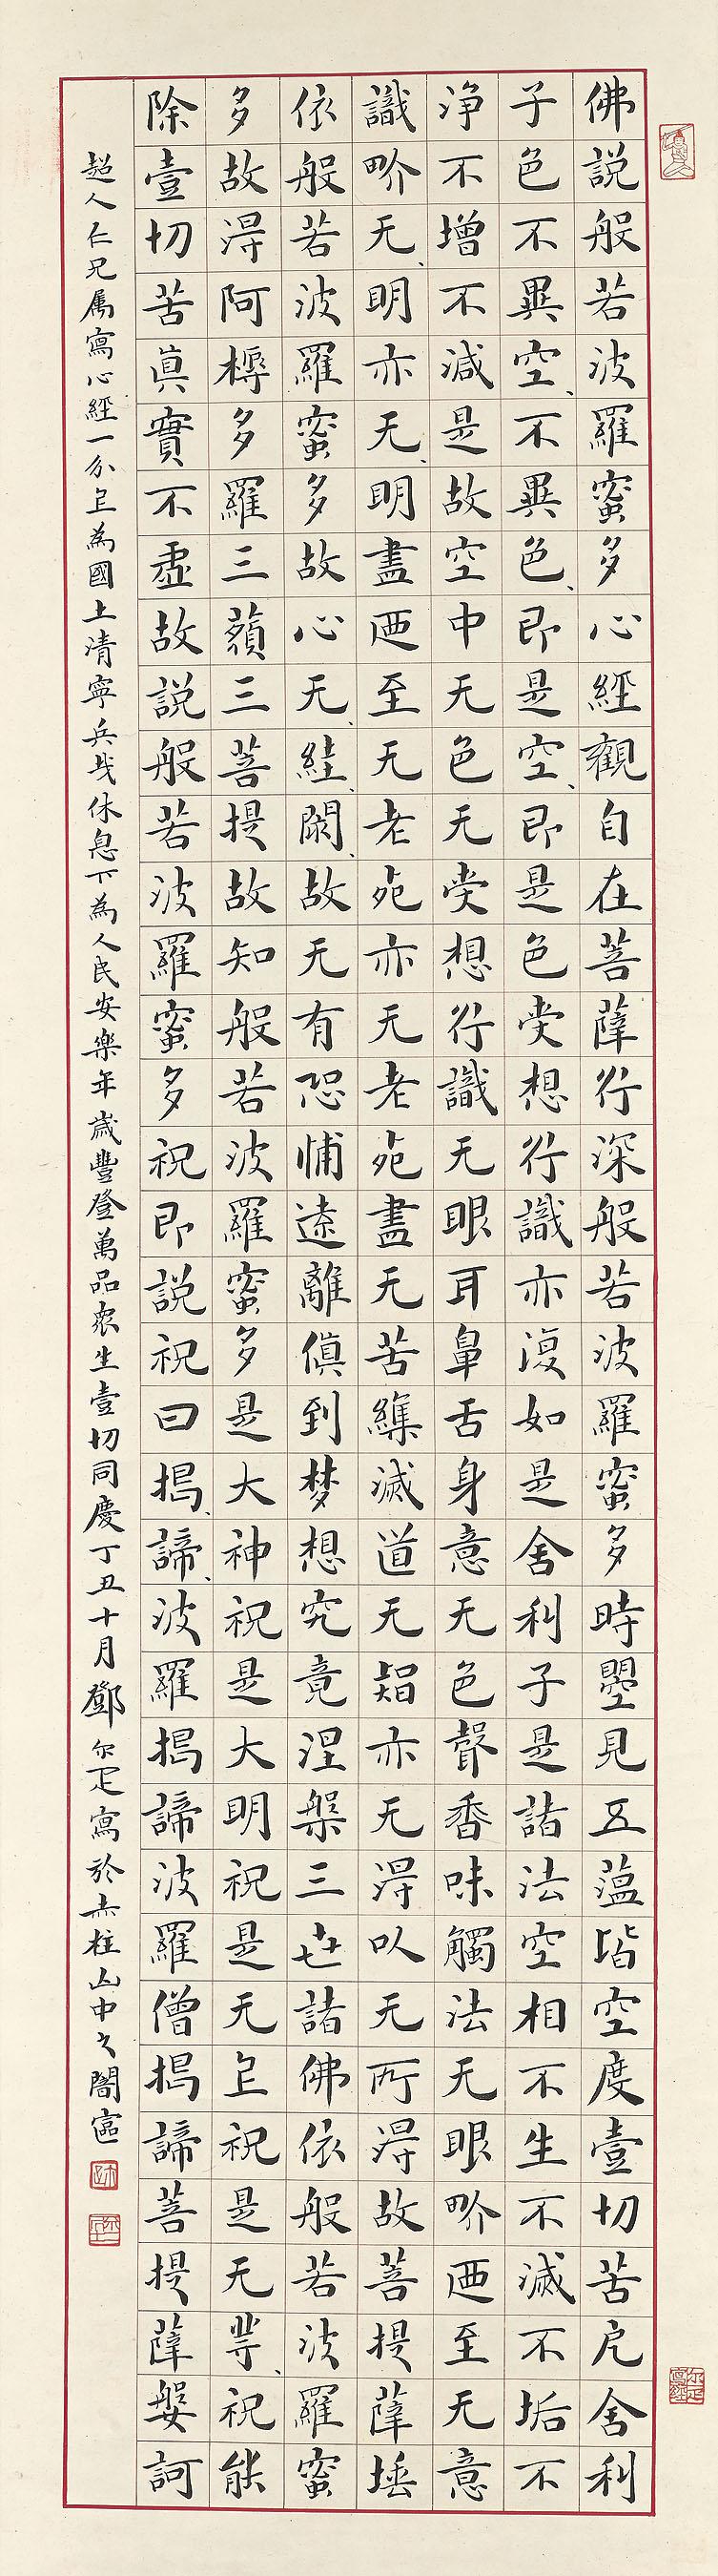 Heart Sutra in Standard Script Calligraphy